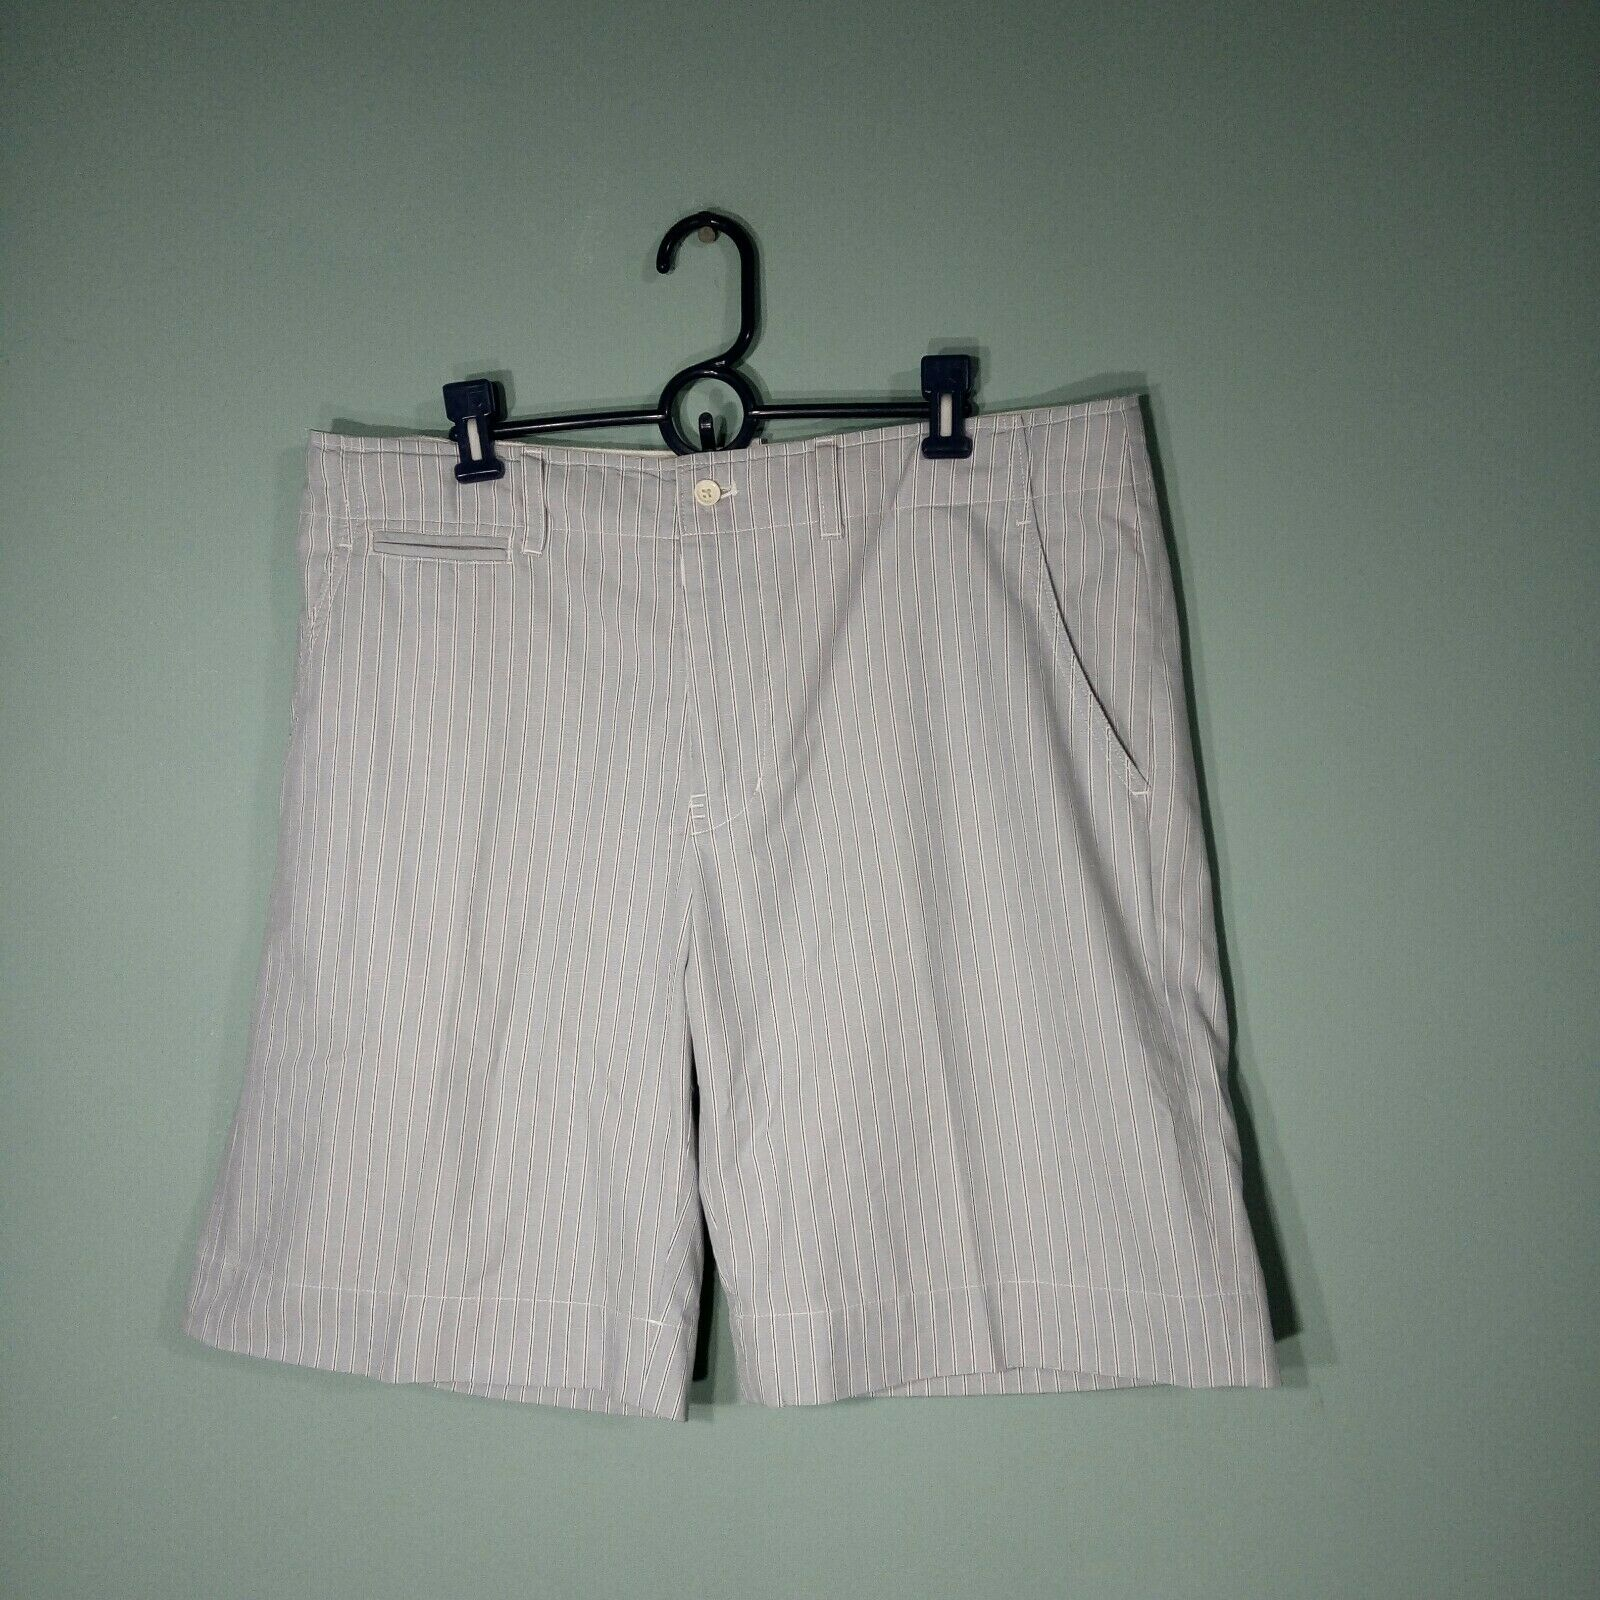 Polo Ralph Lauren Men's Shorts  Cotton Pinstriped  Size 36